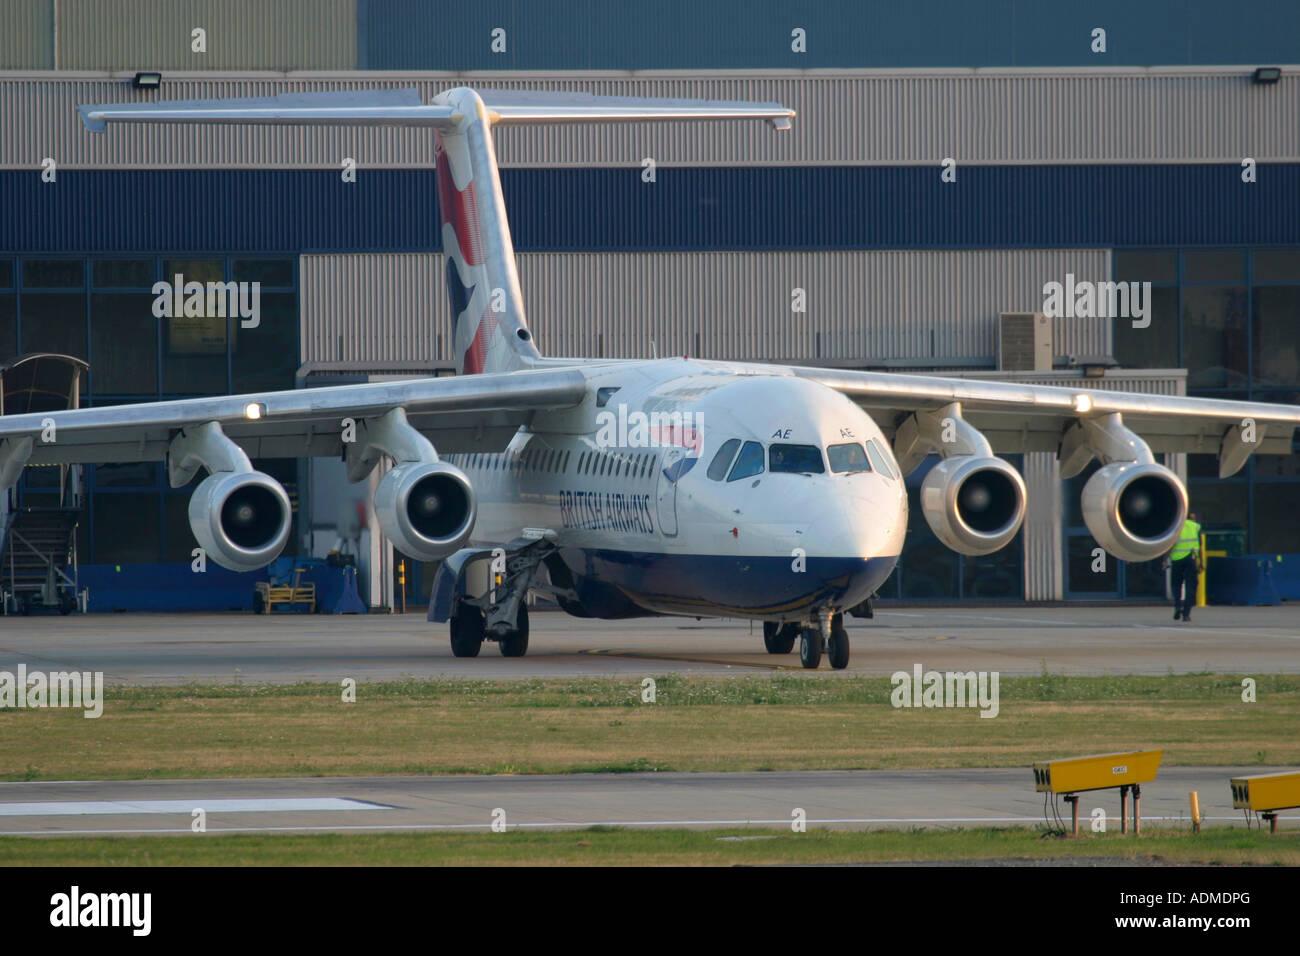 British Airways BAE Systems Avro 146 RJ100 - Stock Image